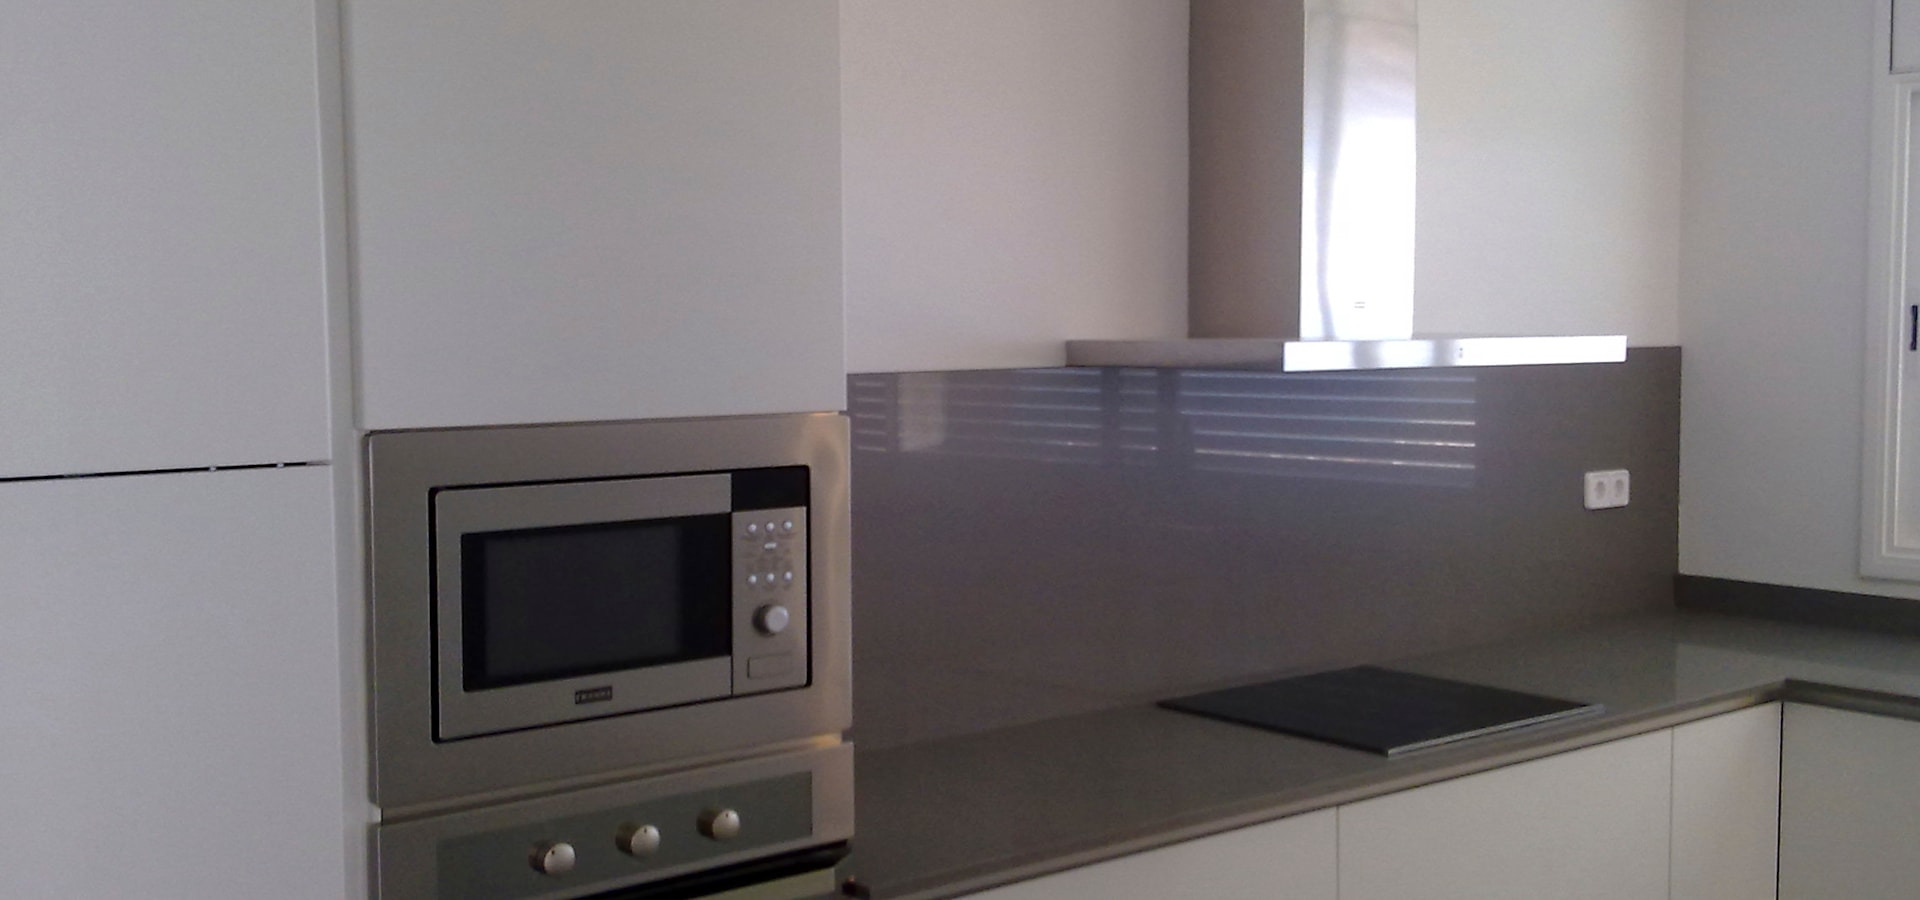 Escudero disseny s l u ampliaci n cocina comedor en for Ampliacion cocina comedor